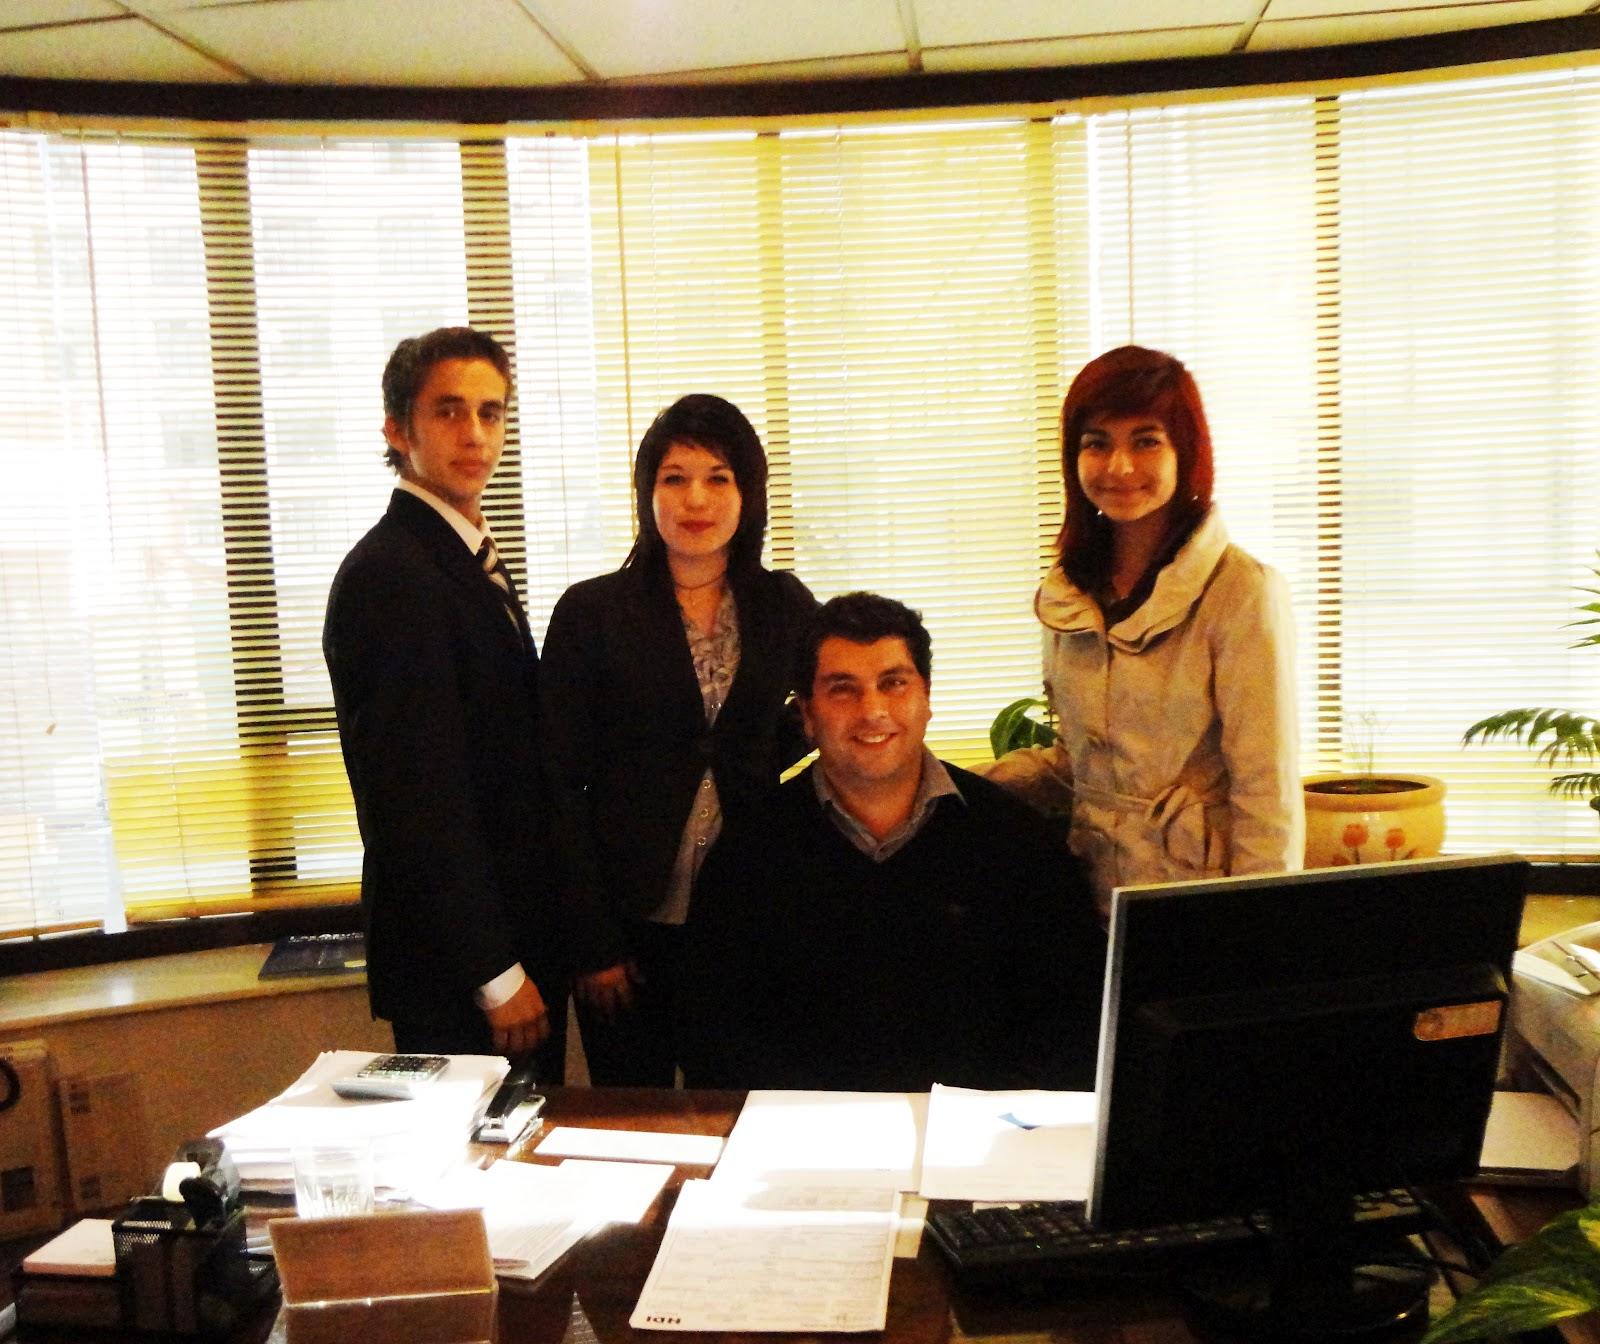 Trabajo comercio exterior banco comercial for Banco exterior empleo